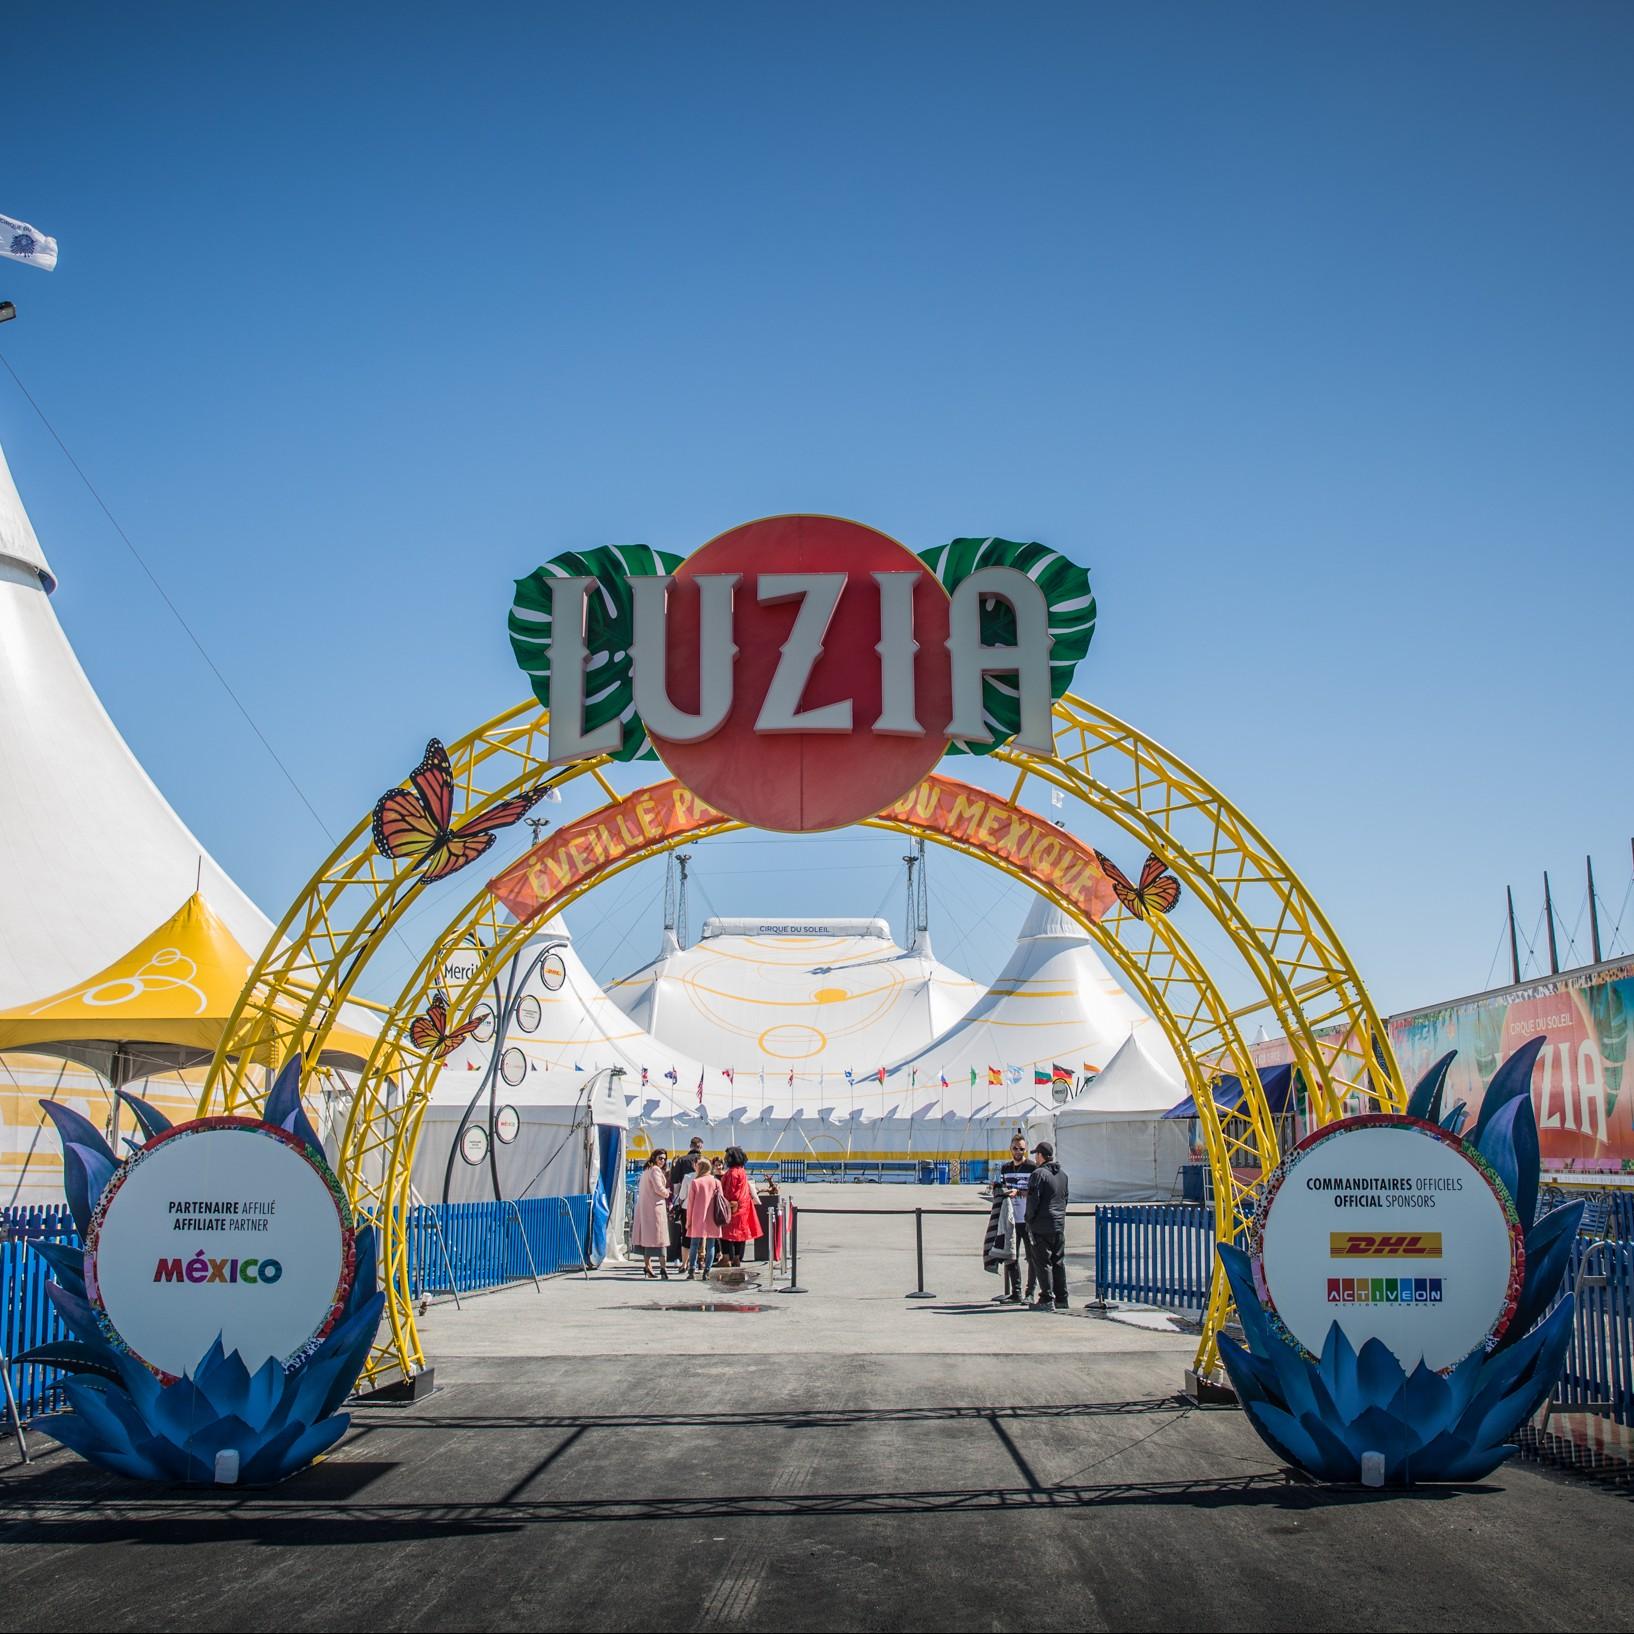 Luzia VIP Montreal Cirque du Soleil (12)